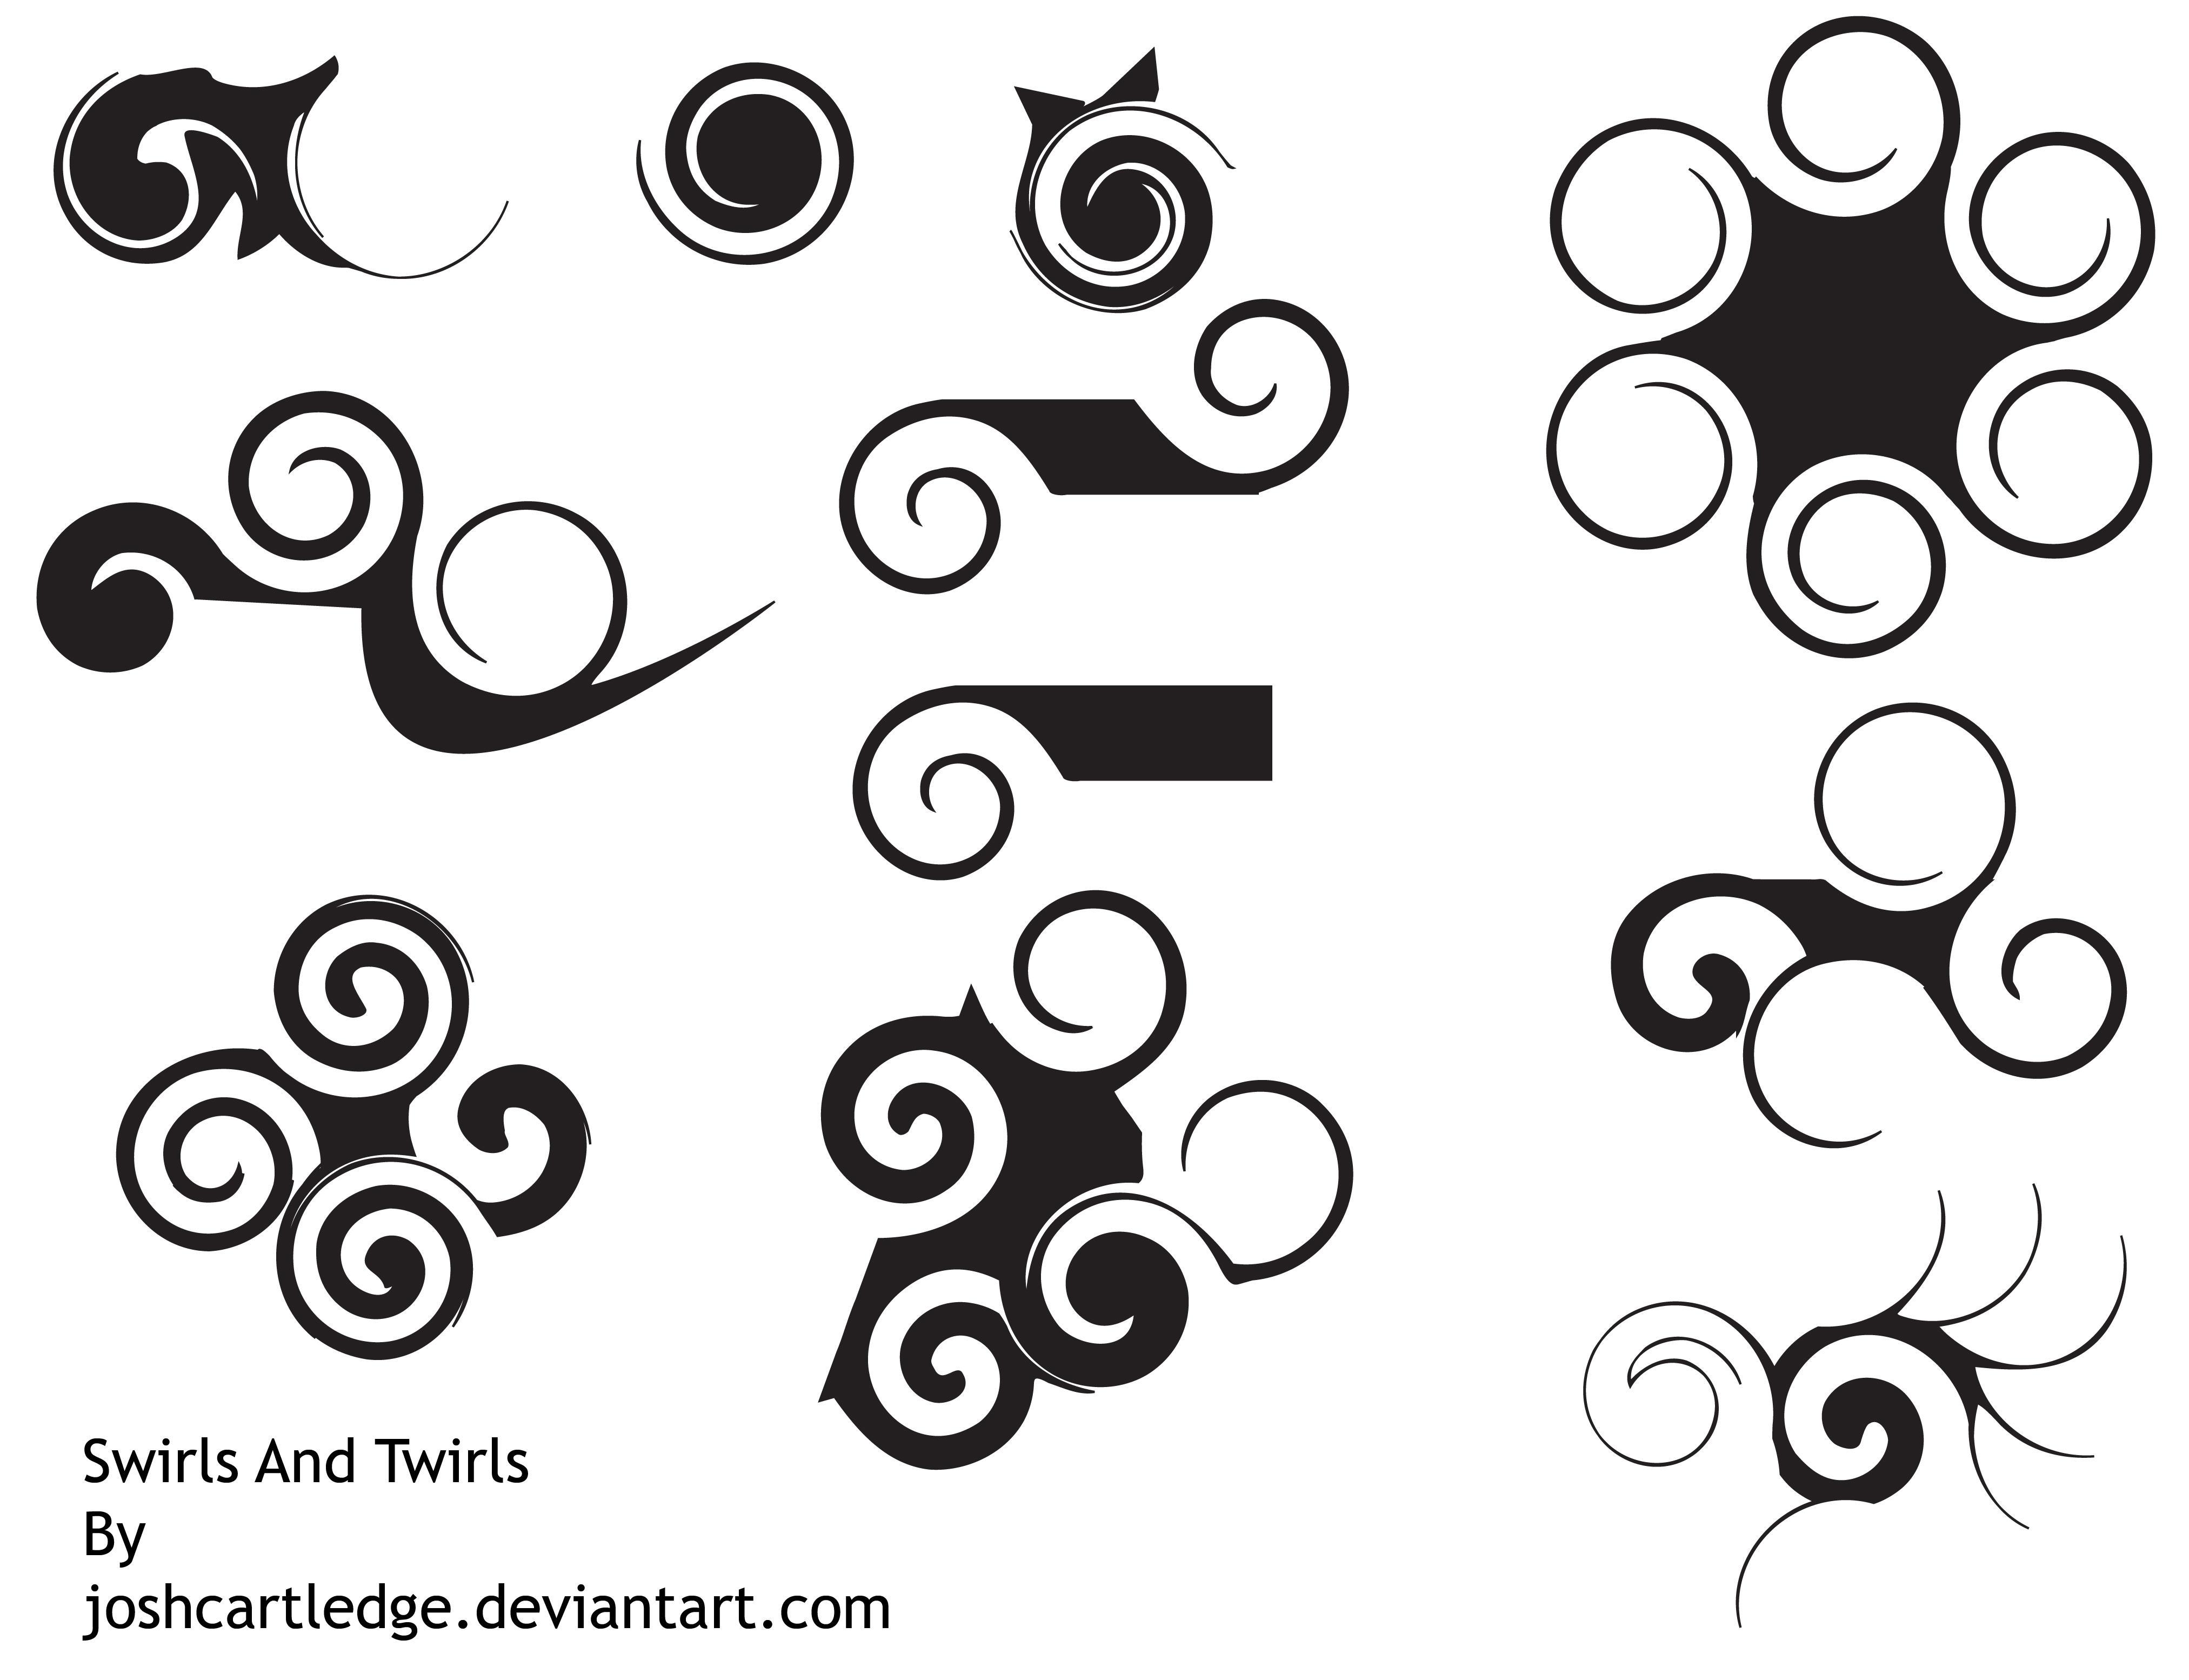 Swirls And Twirls Brushes by joshcartledge